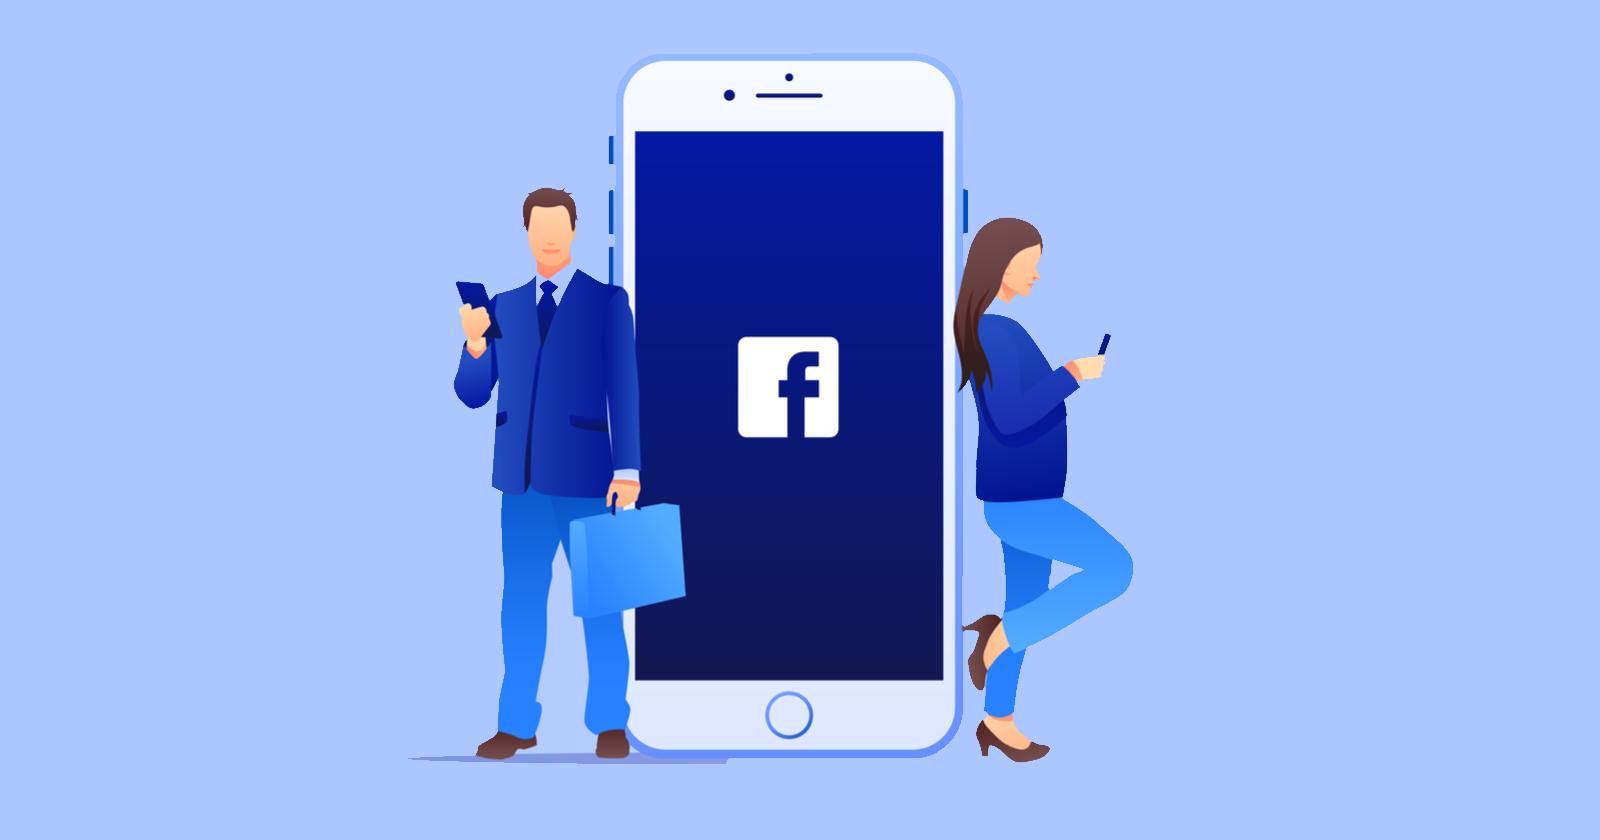 Facebook nije oglasna ploča